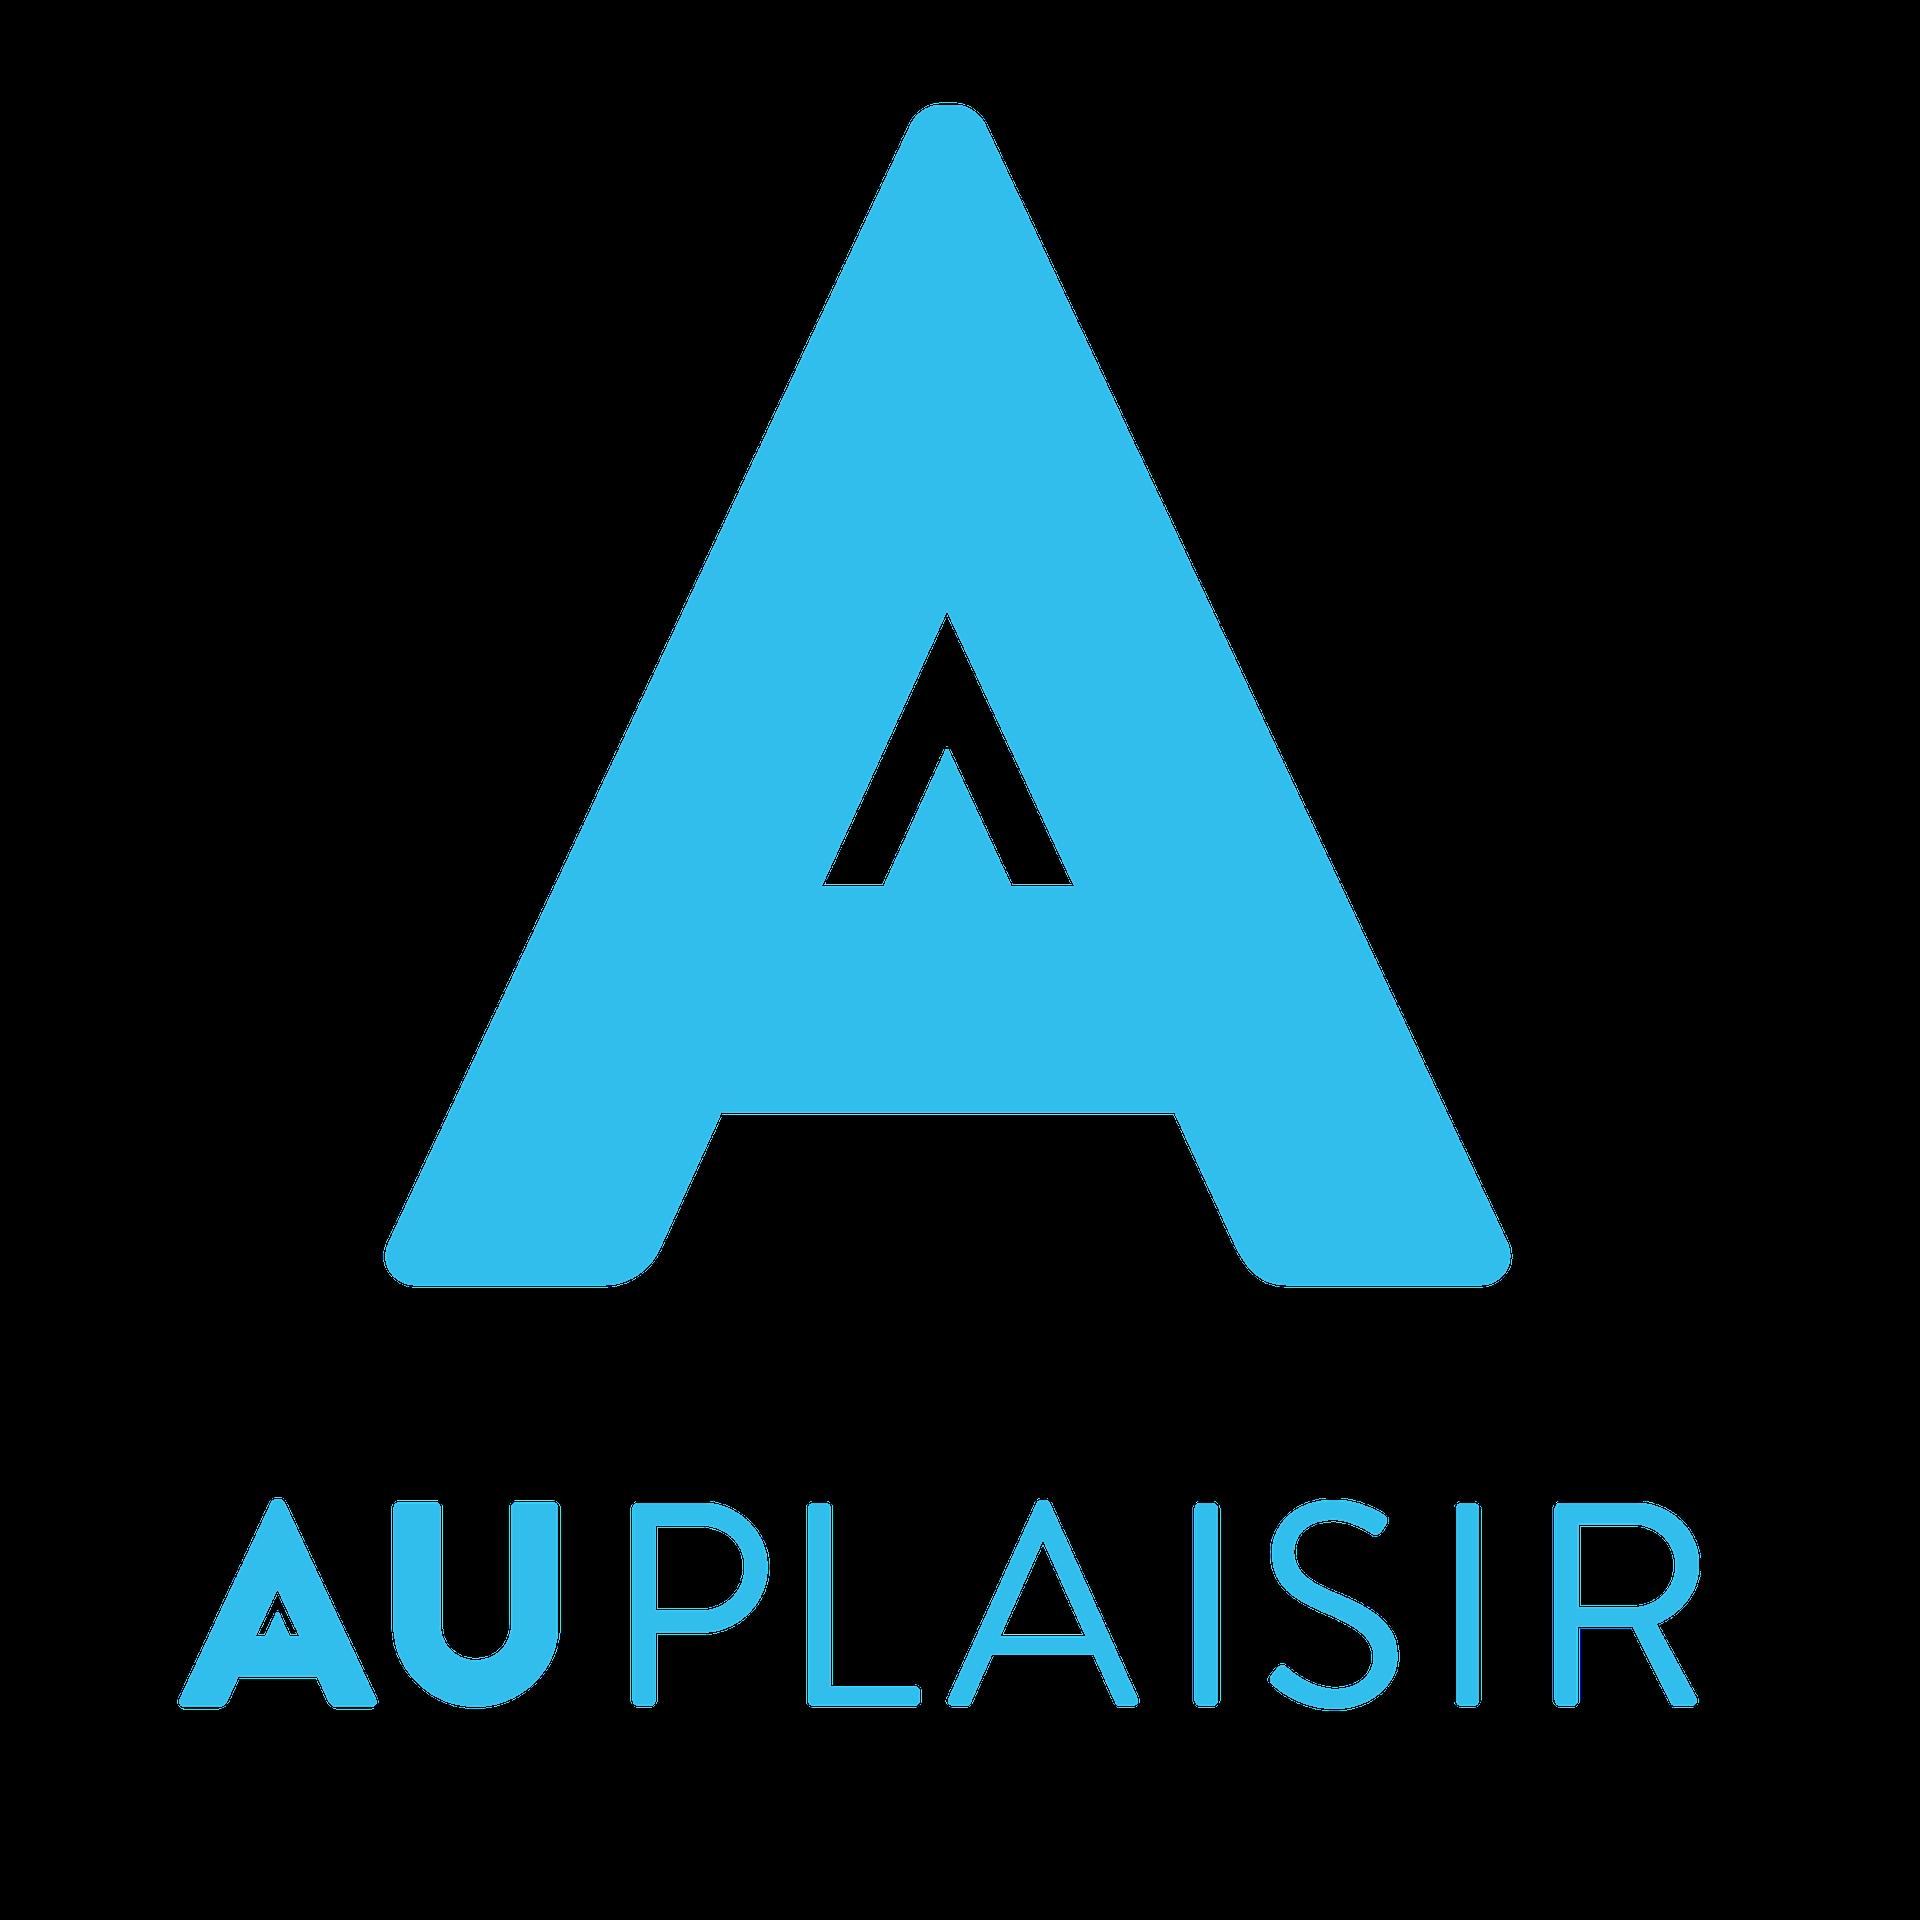 logo - AUplaisir carré-m